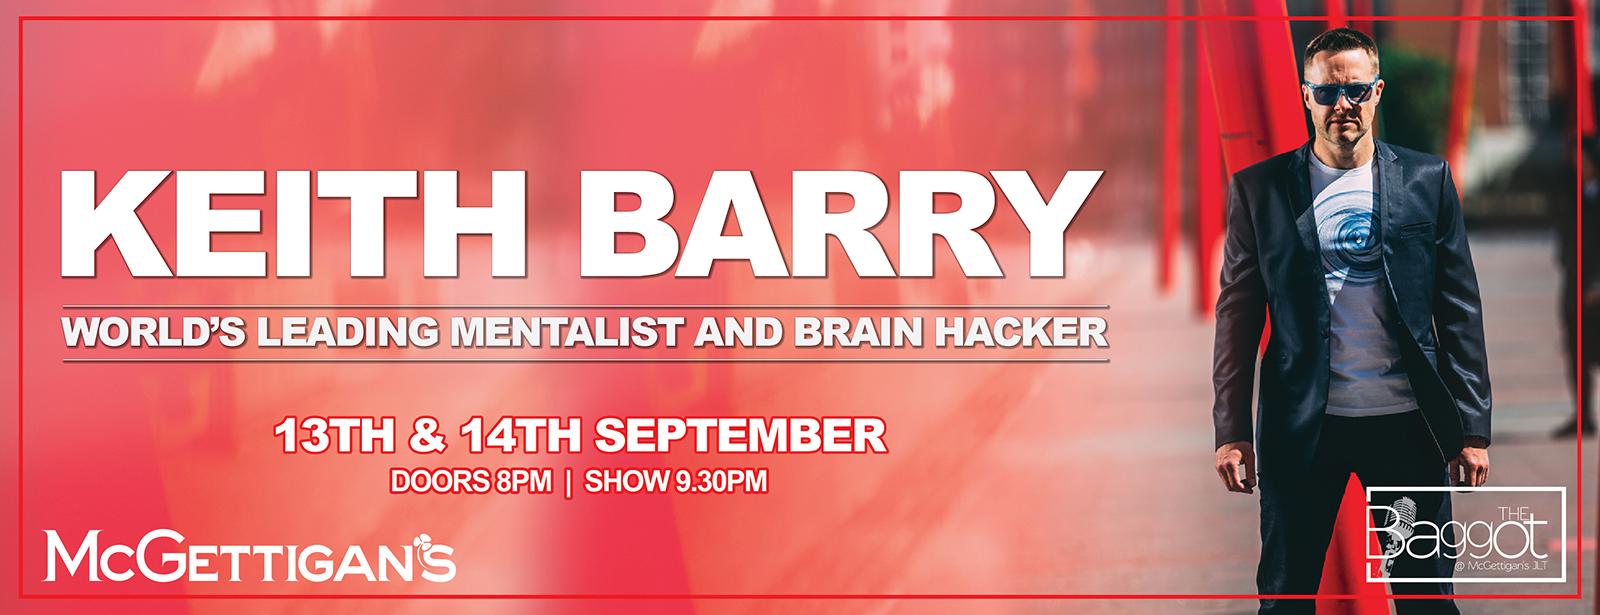 Keith Barry Live in Dubai